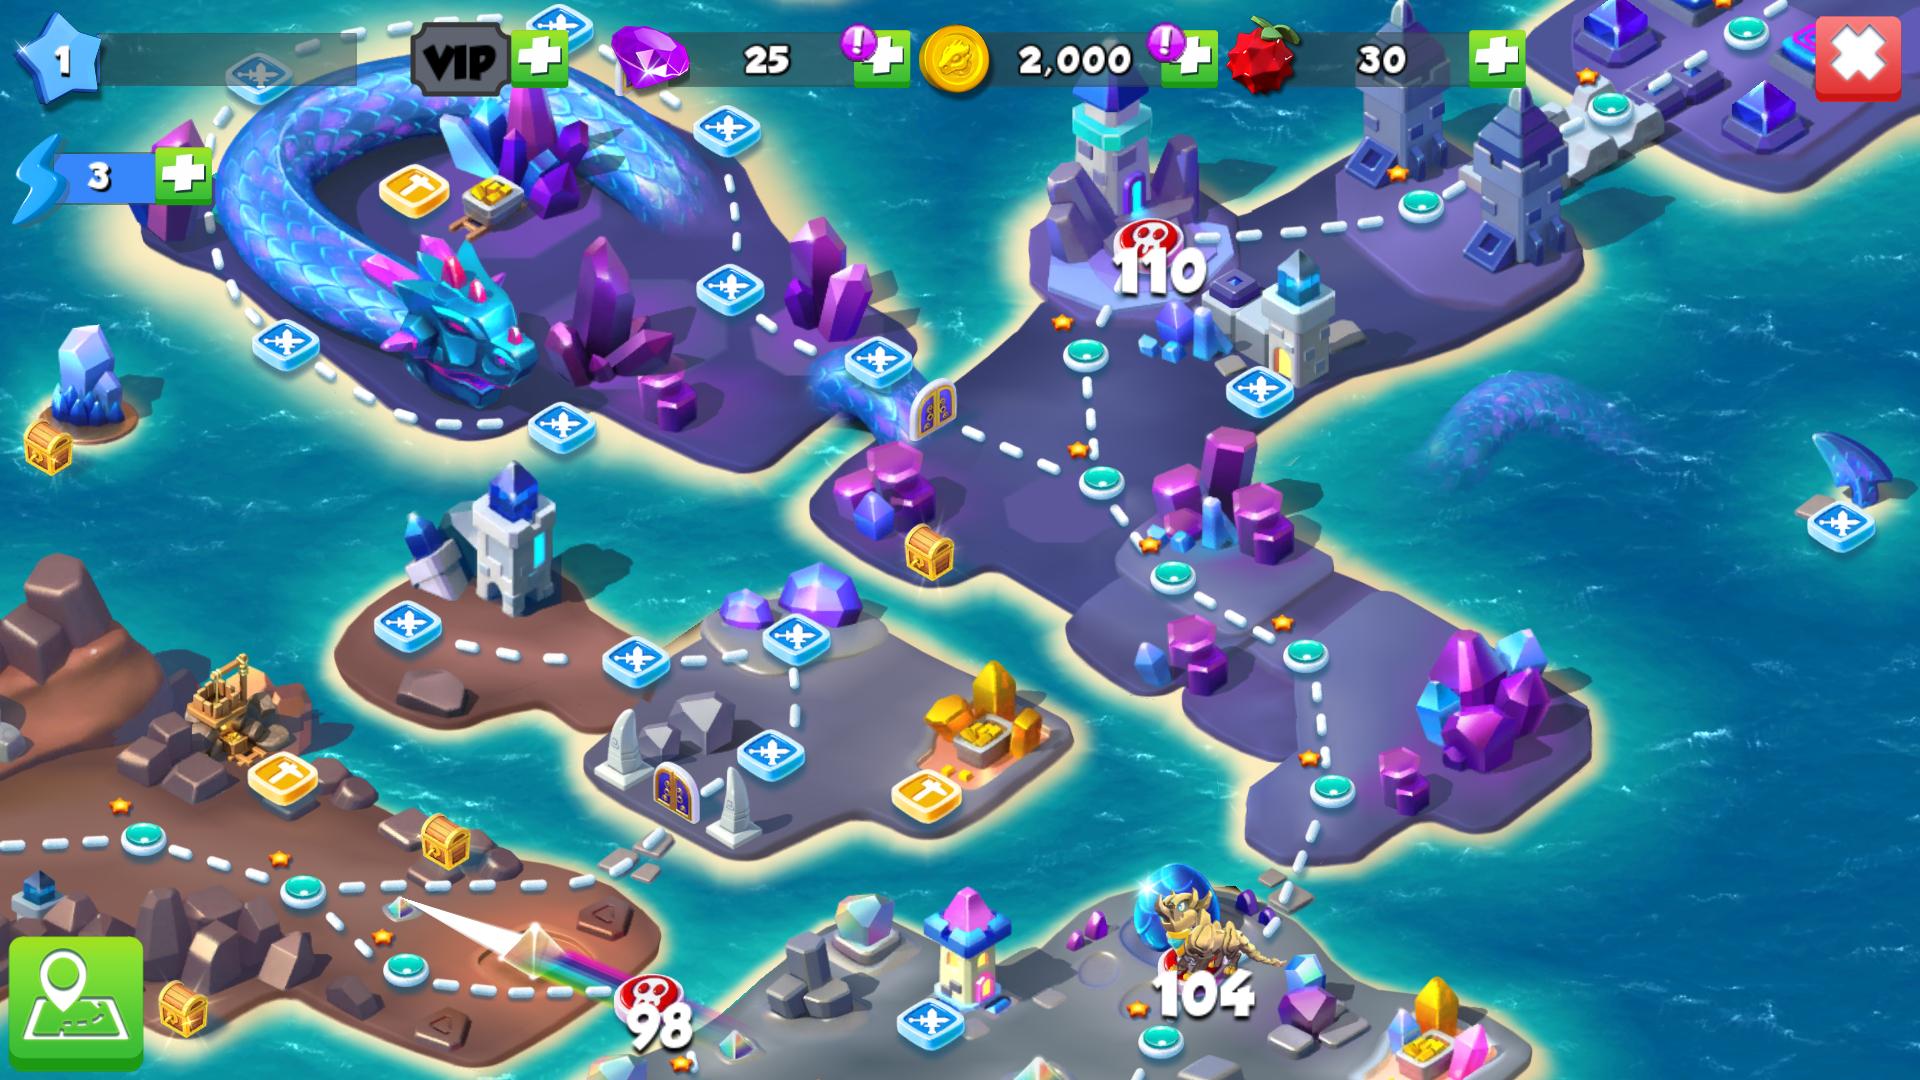 Dragon Mania Legends 1.0.0j Mod Apk - Download Here | AxeeTech